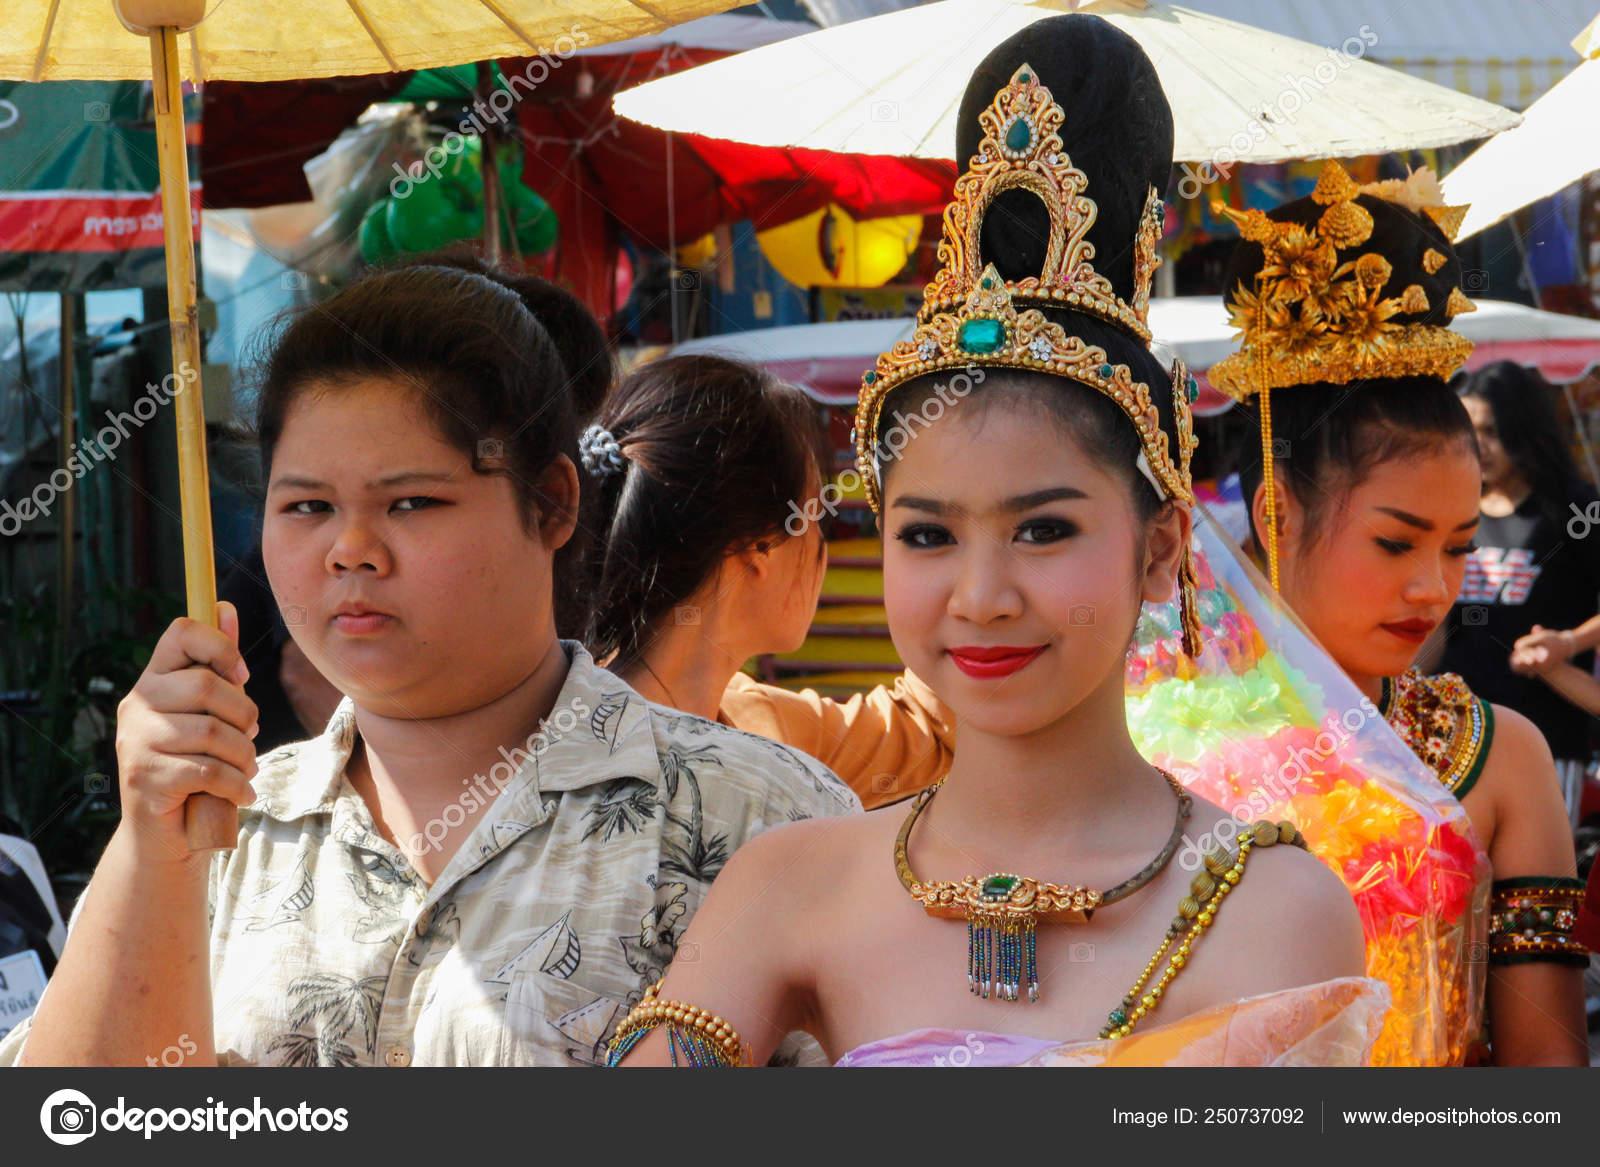 Wedding March 3.Ayutthaya Thailand March 2018 Wedding Ceremony Street Young